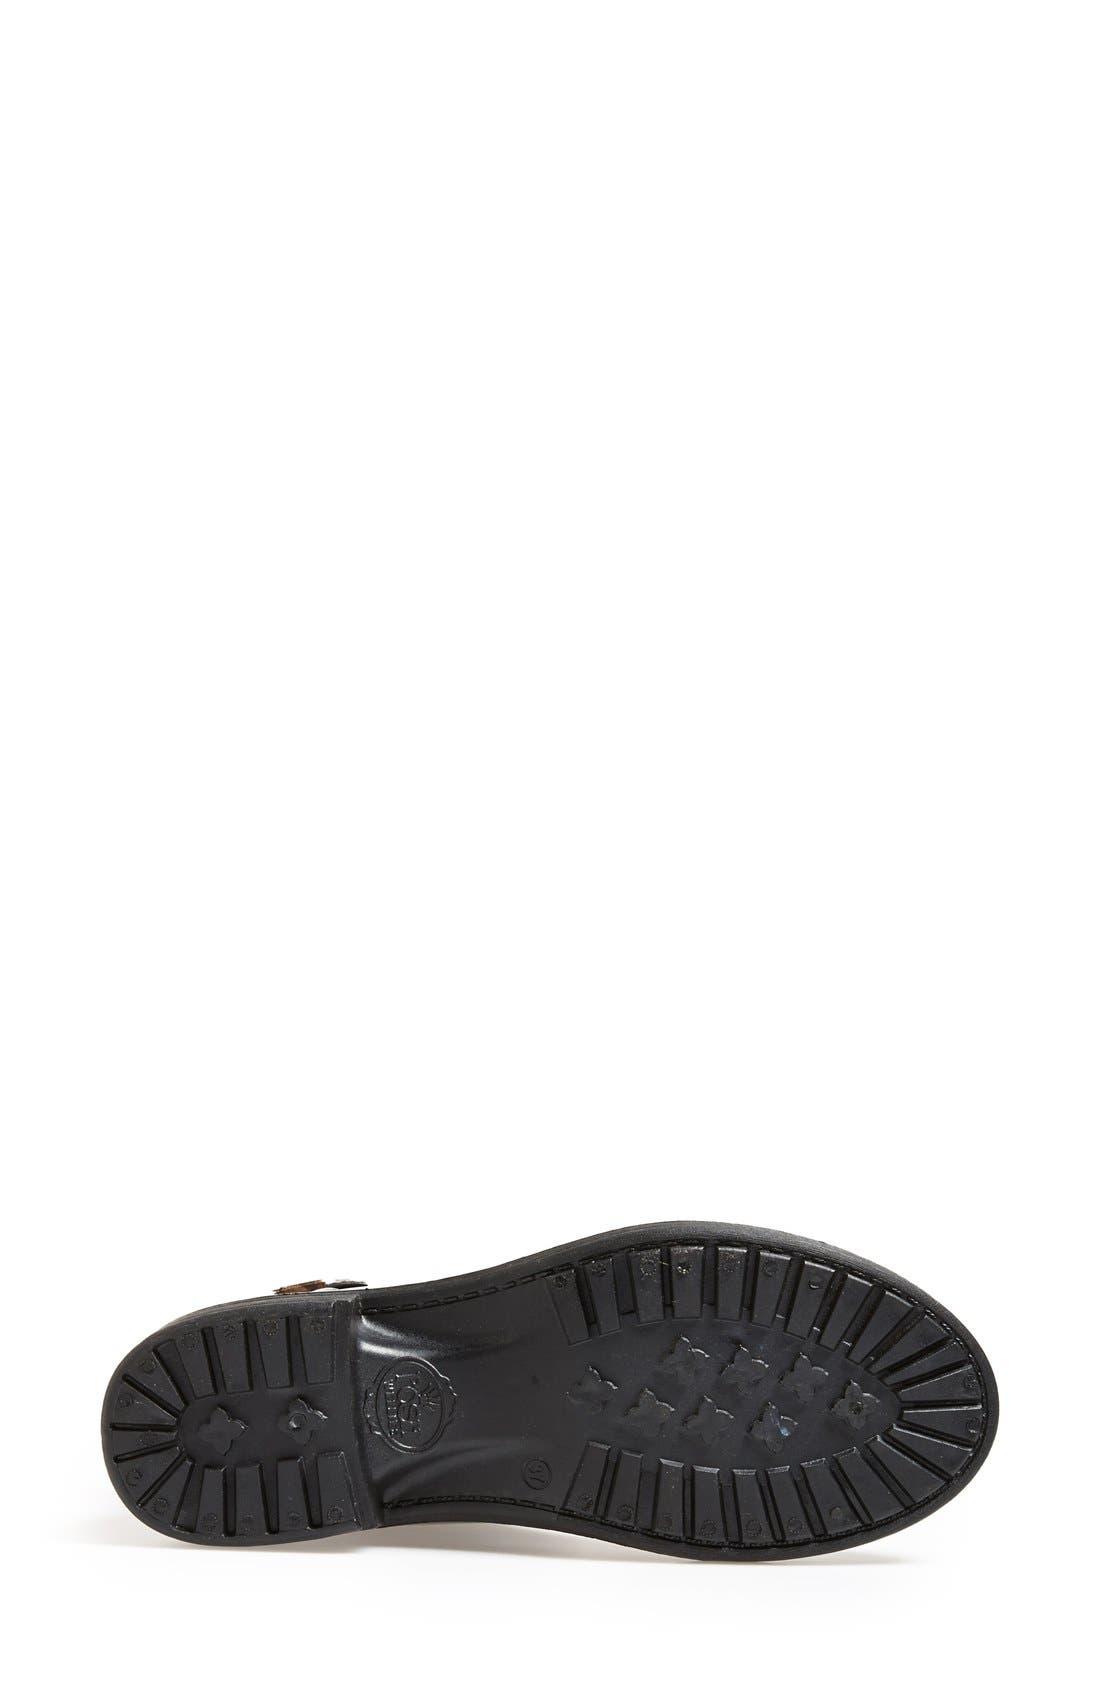 Alternate Image 4  - Posh Wellies 'Peacon' Quilted Tall Rain Boot (Women)